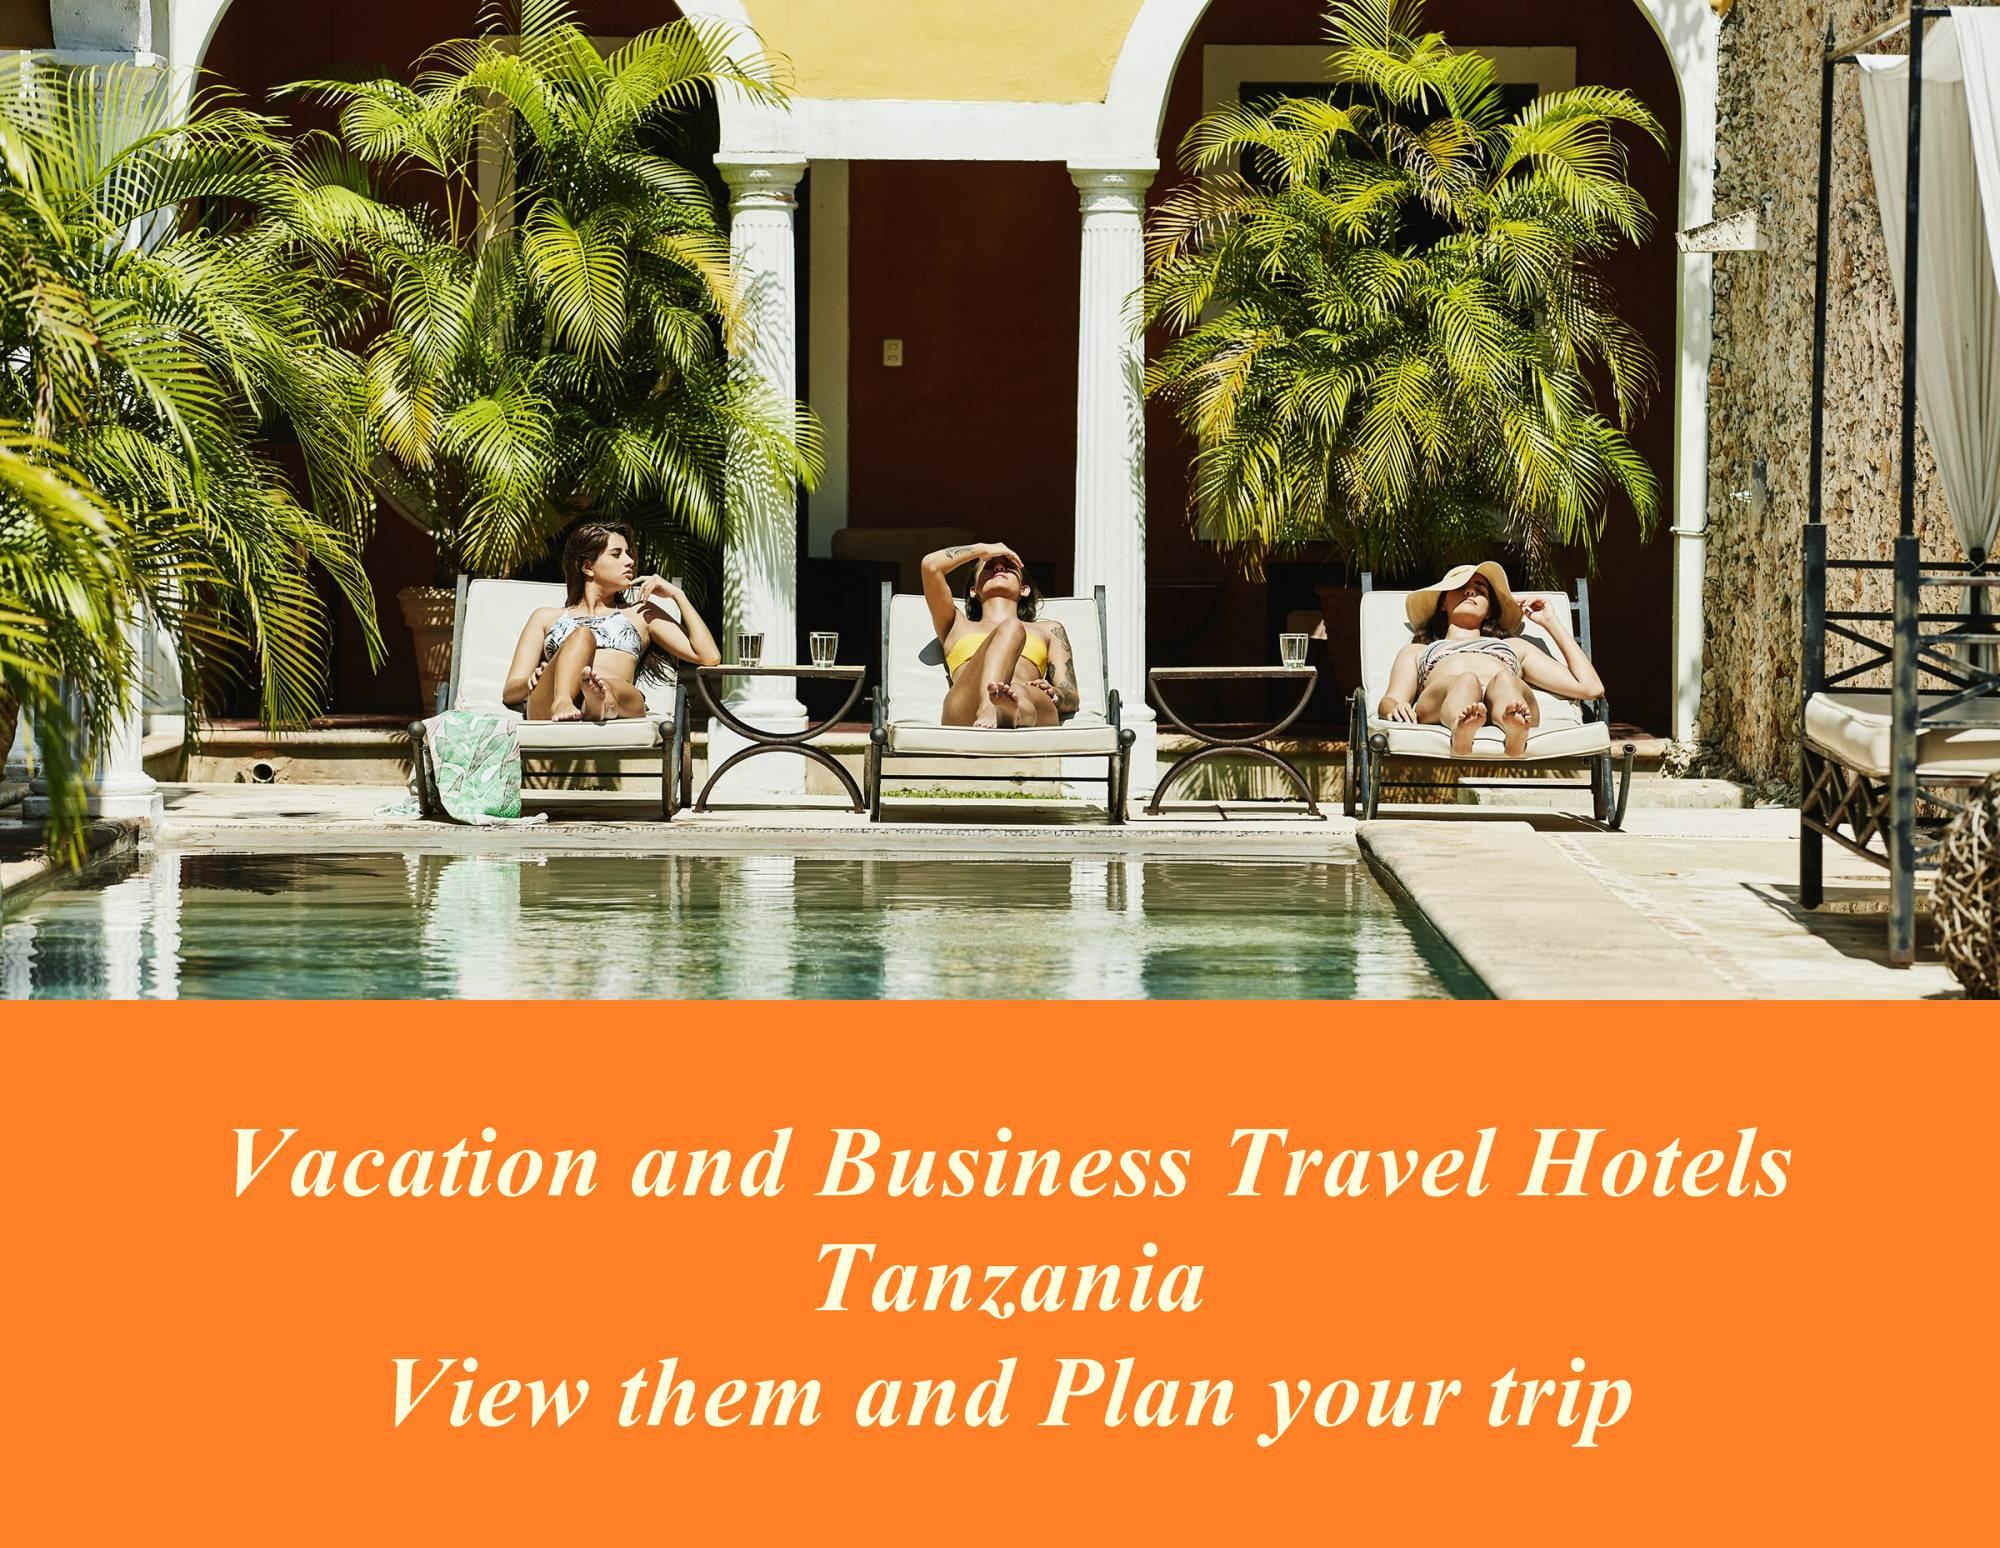 Luisguide Hotels